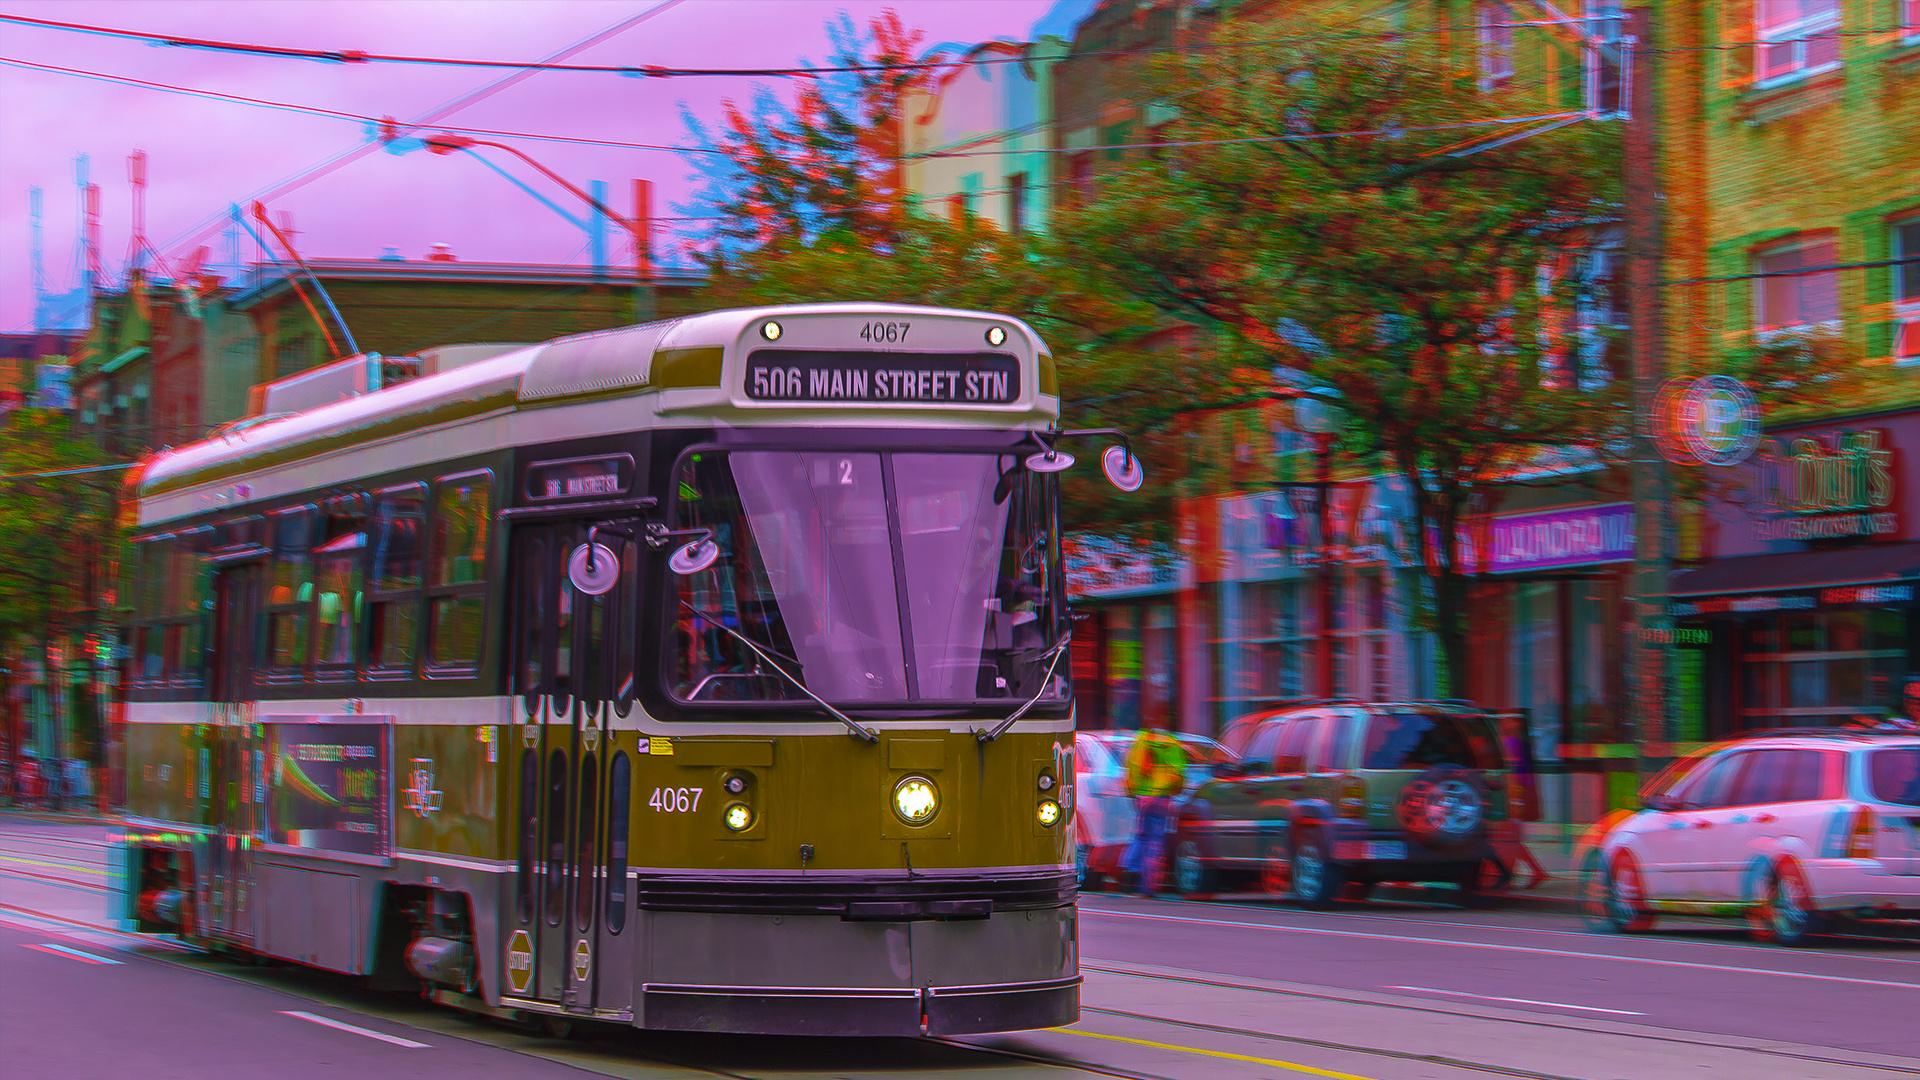 Straßenbahn in Toronto 3-D